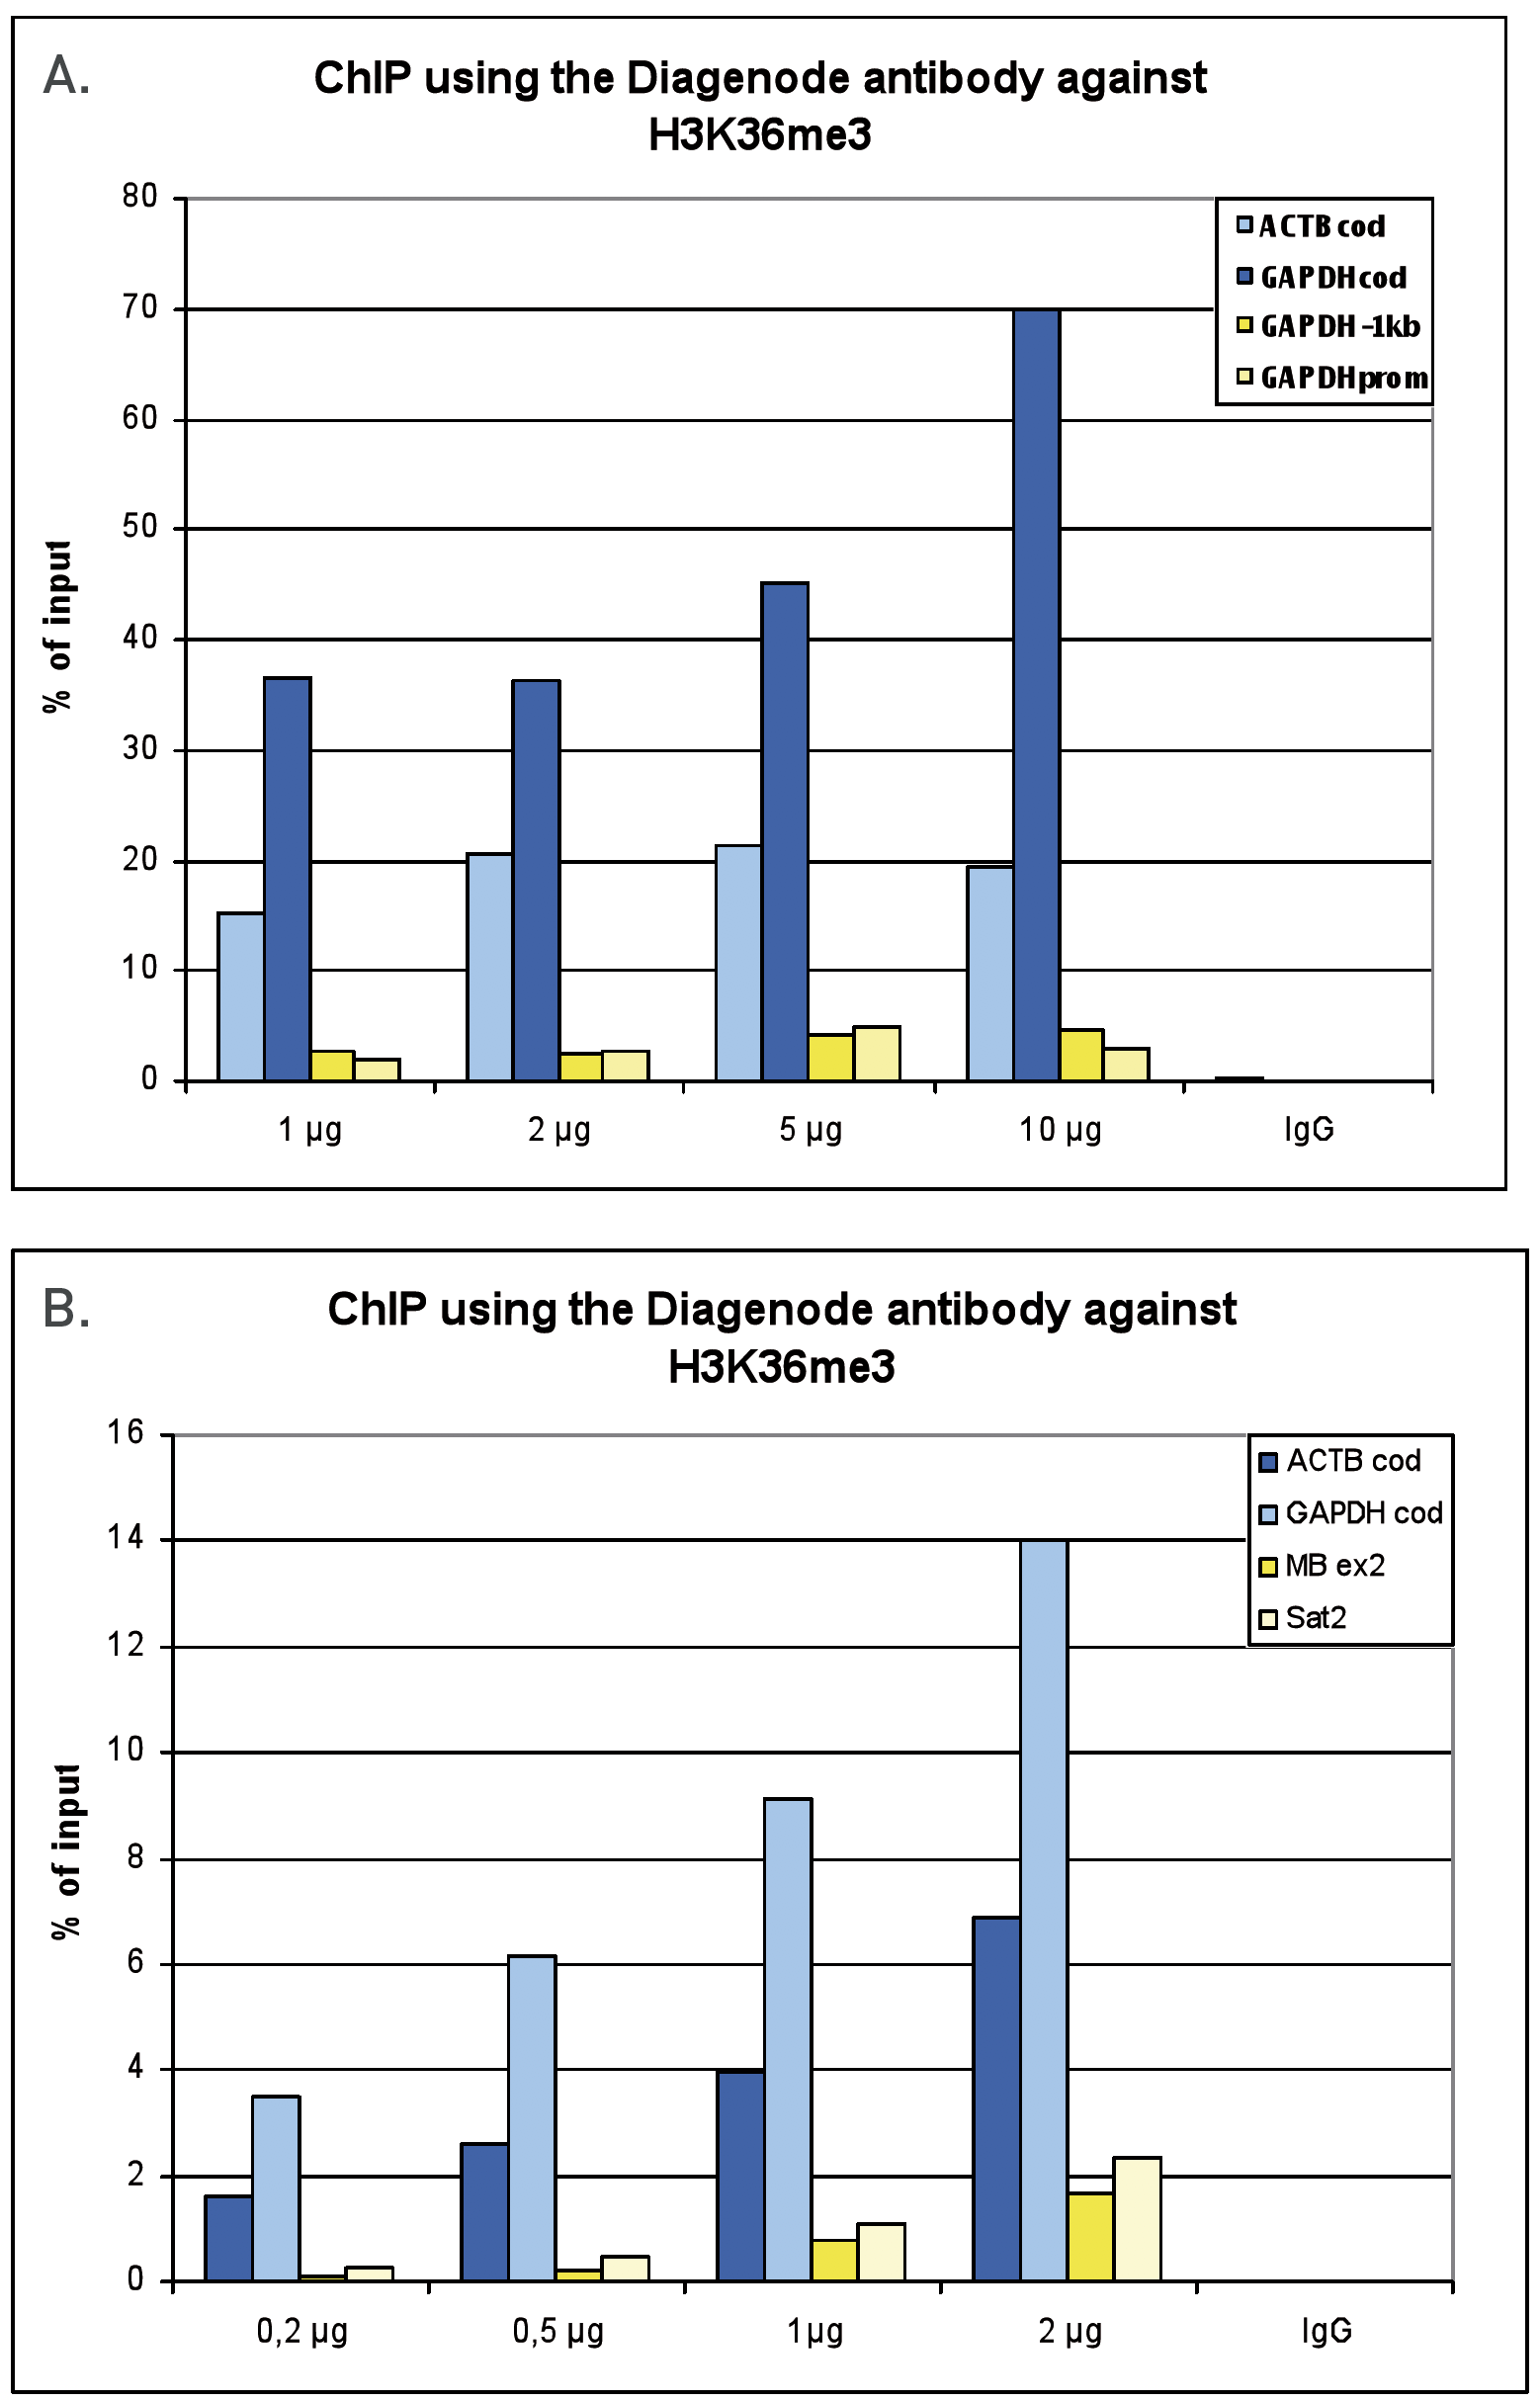 H3K36me3 Antibody ChIP Grade